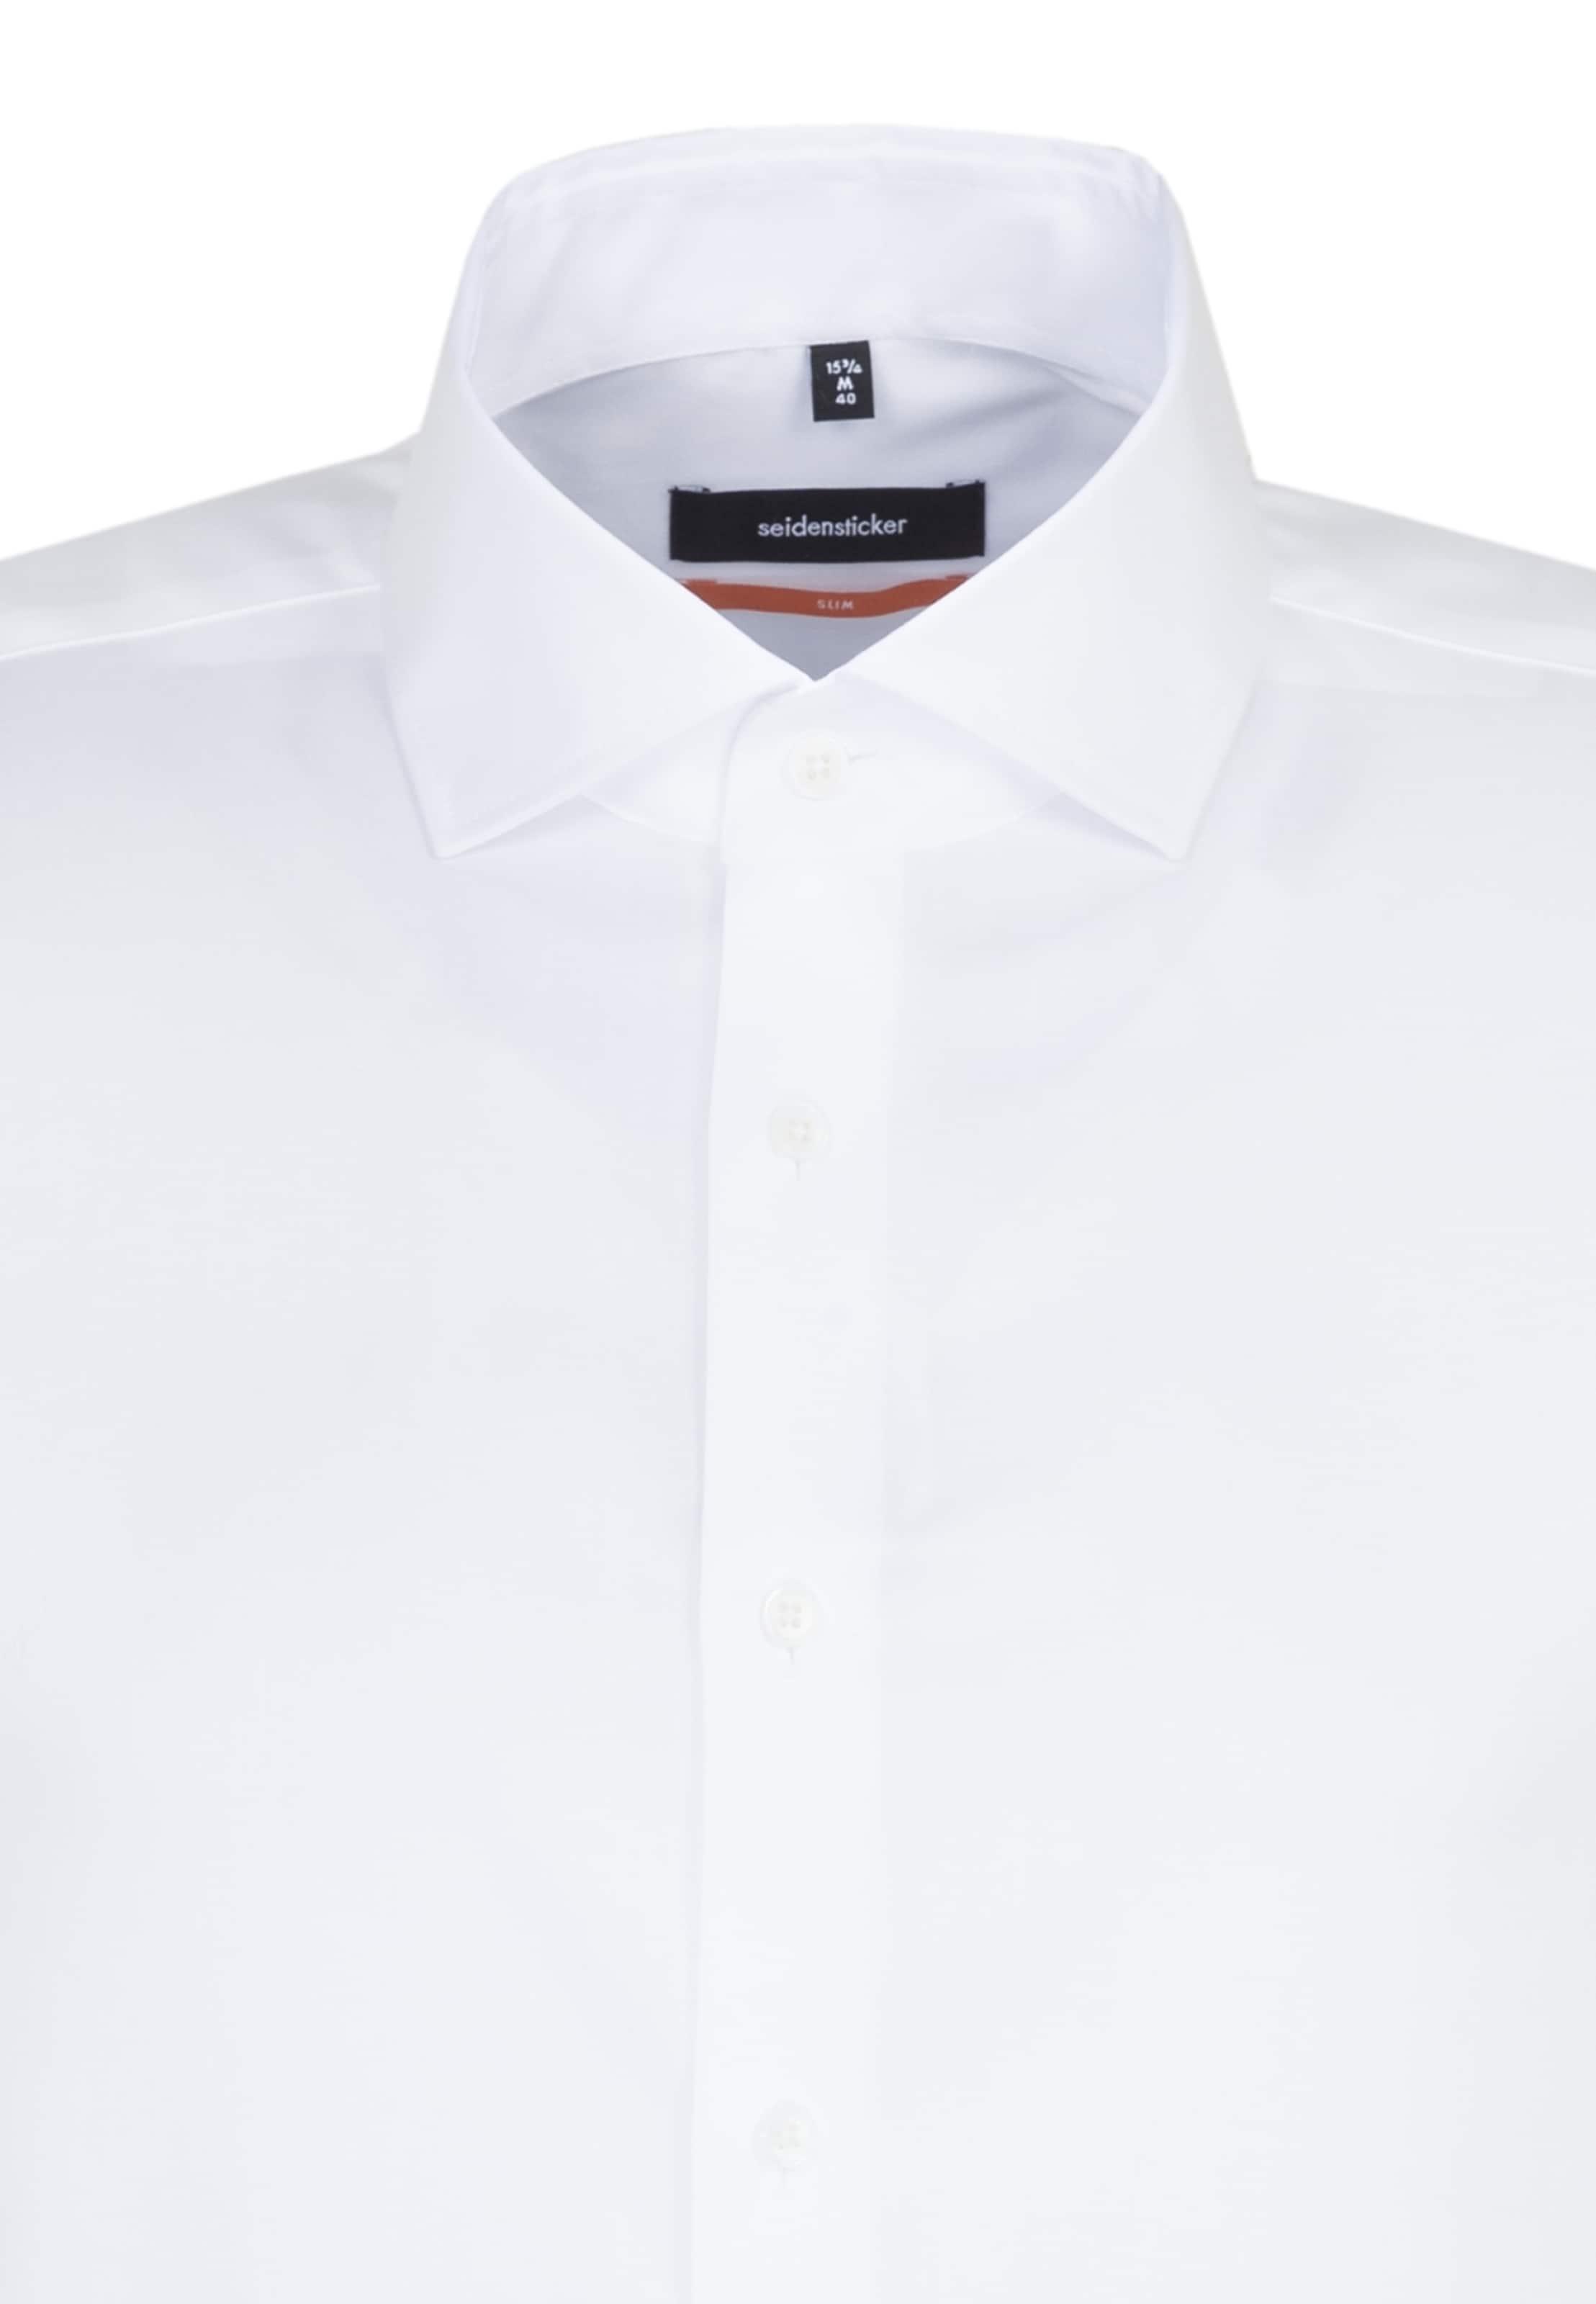 Hemd Weiß Weiß In Hemd In Hemd Seidensticker Seidensticker Seidensticker In Weiß eWYEDHI92b